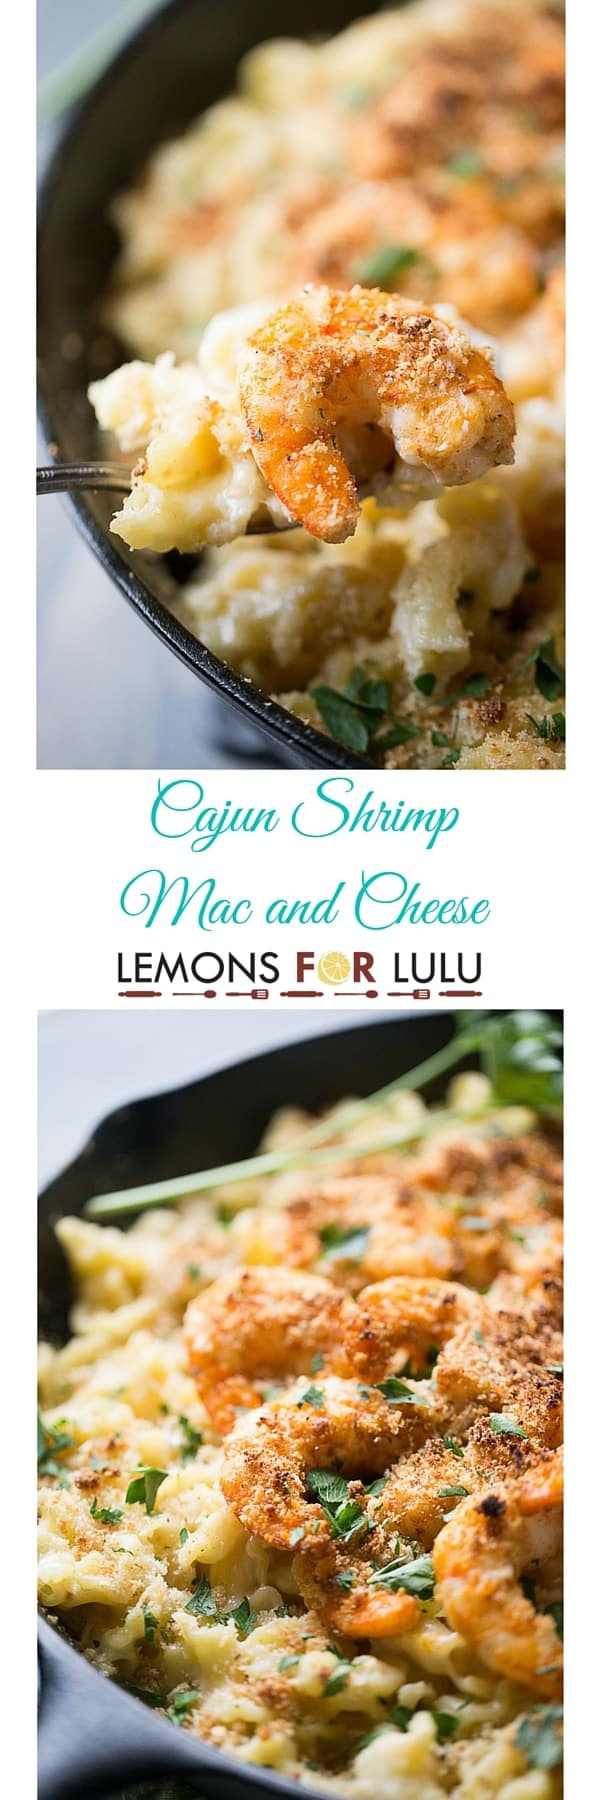 Cajun shrimp title image